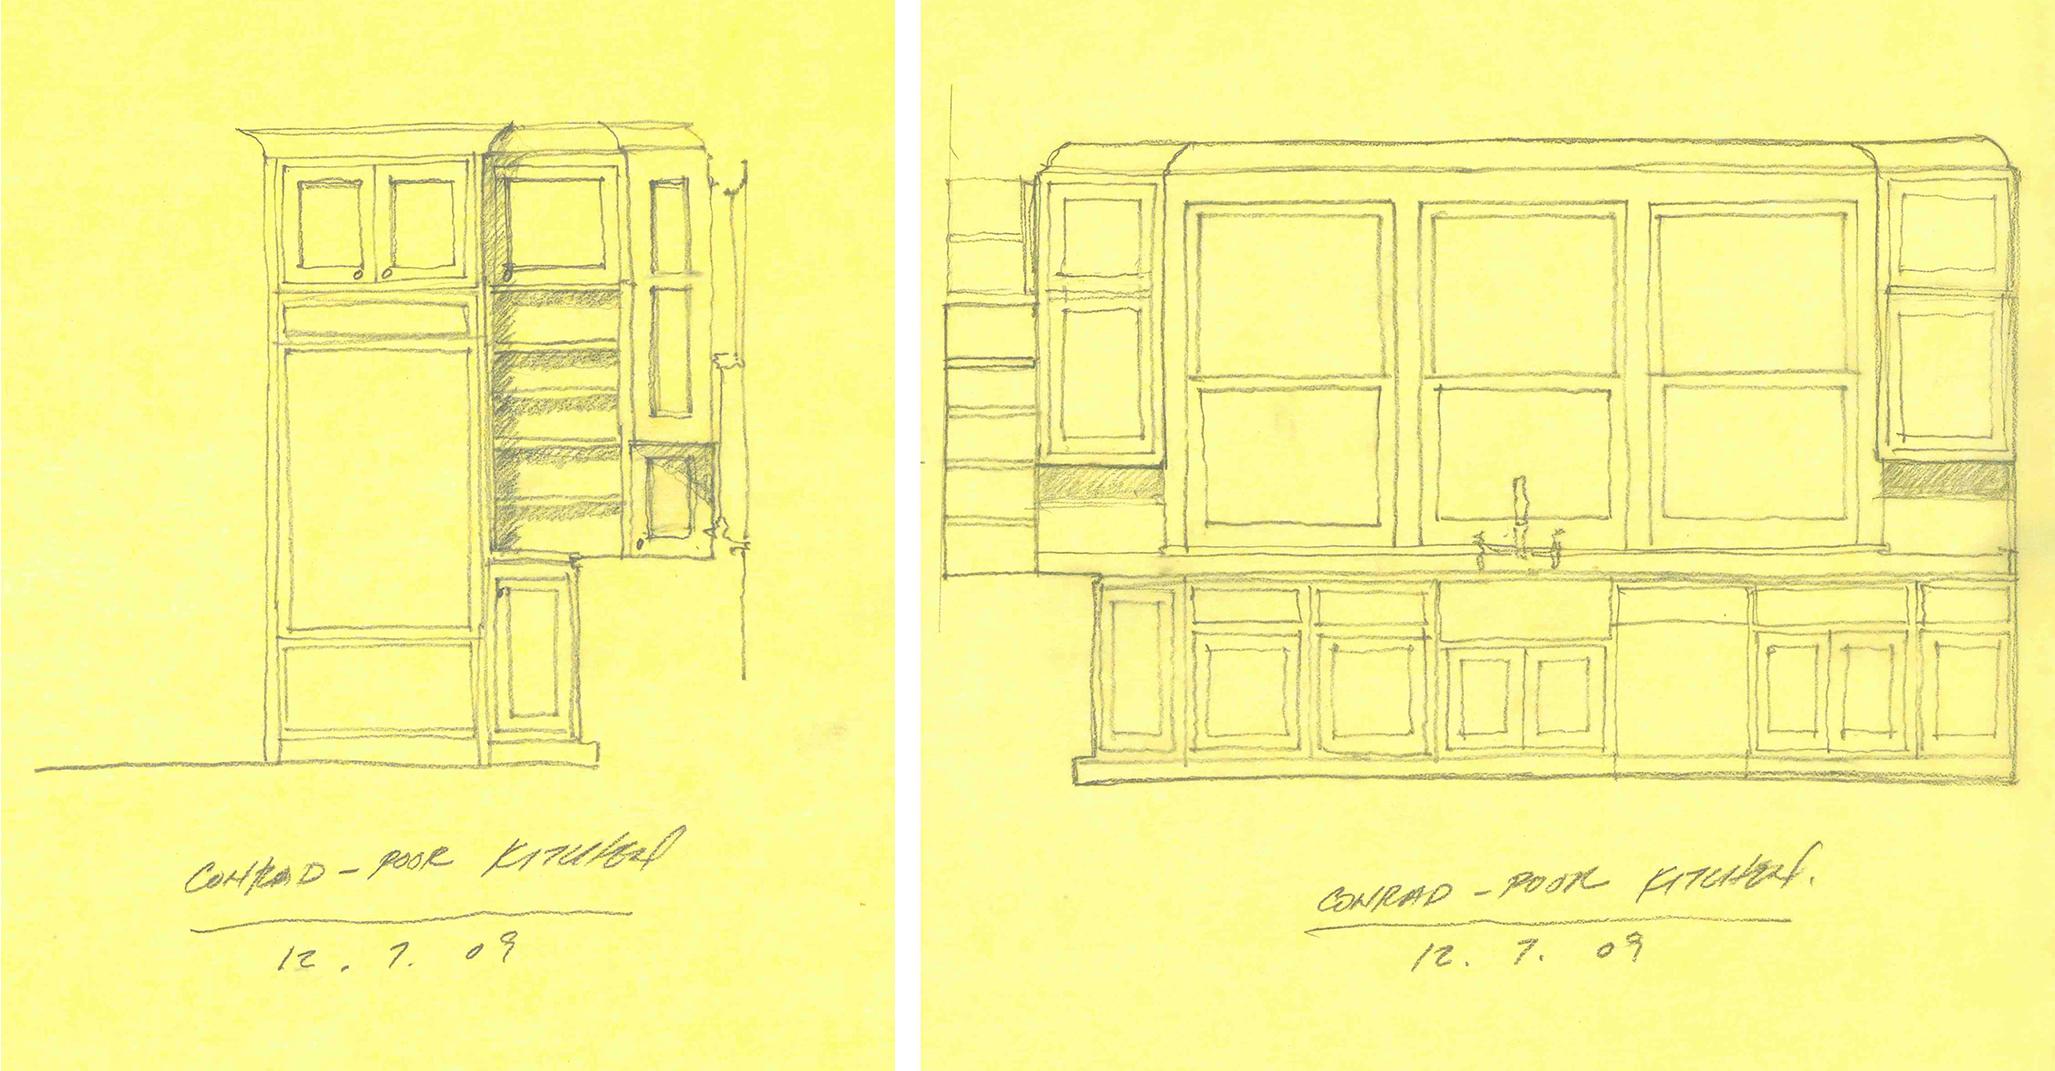 Schematic Design Sketches by Marvin Clawson